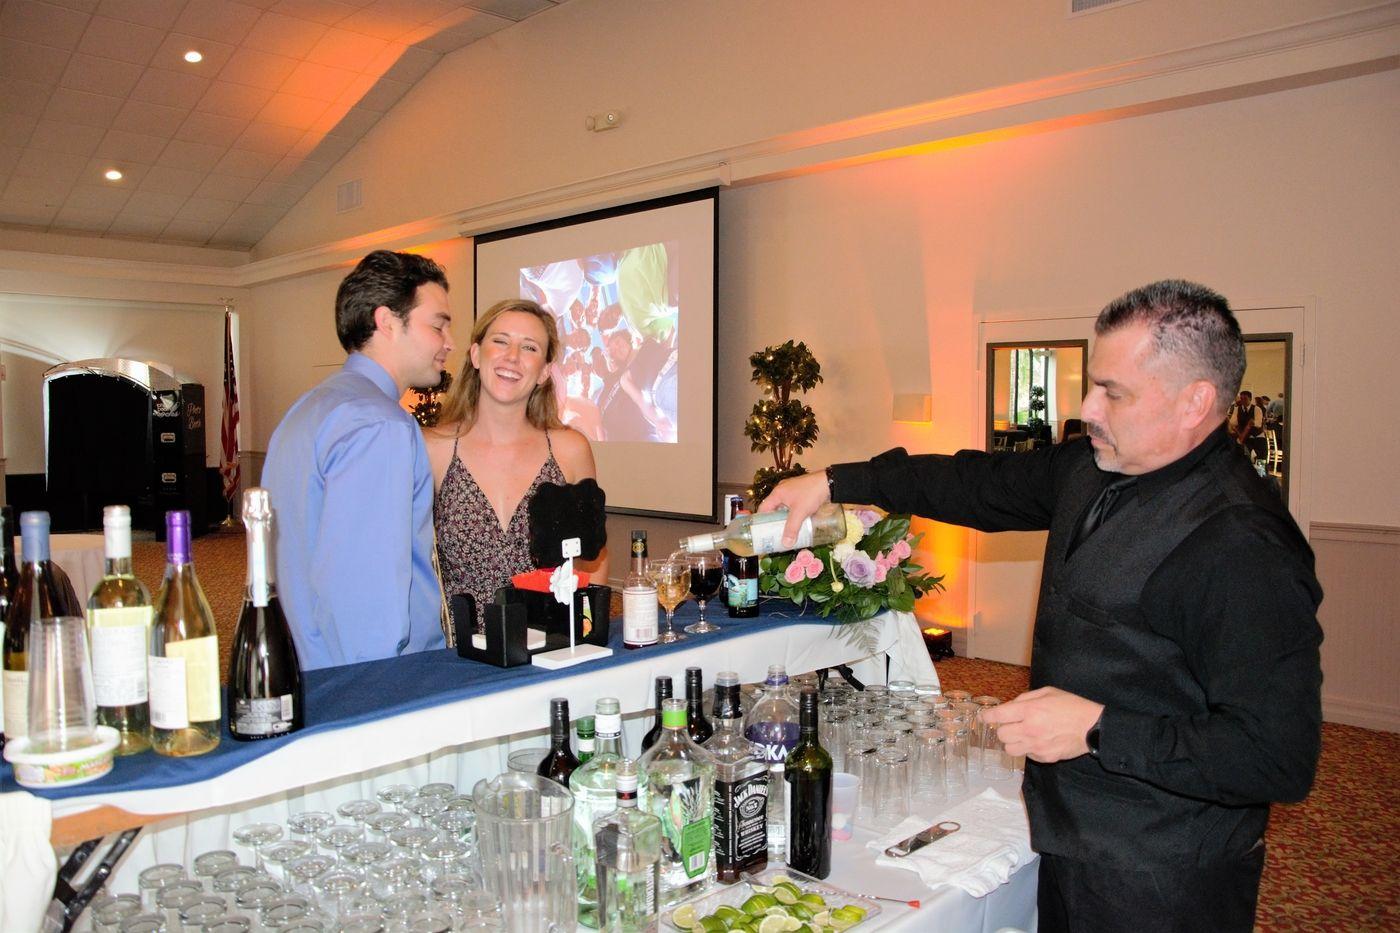 Ipw Reception Corporate Event Photographyorlando Wedding: Wedding Reception Catering